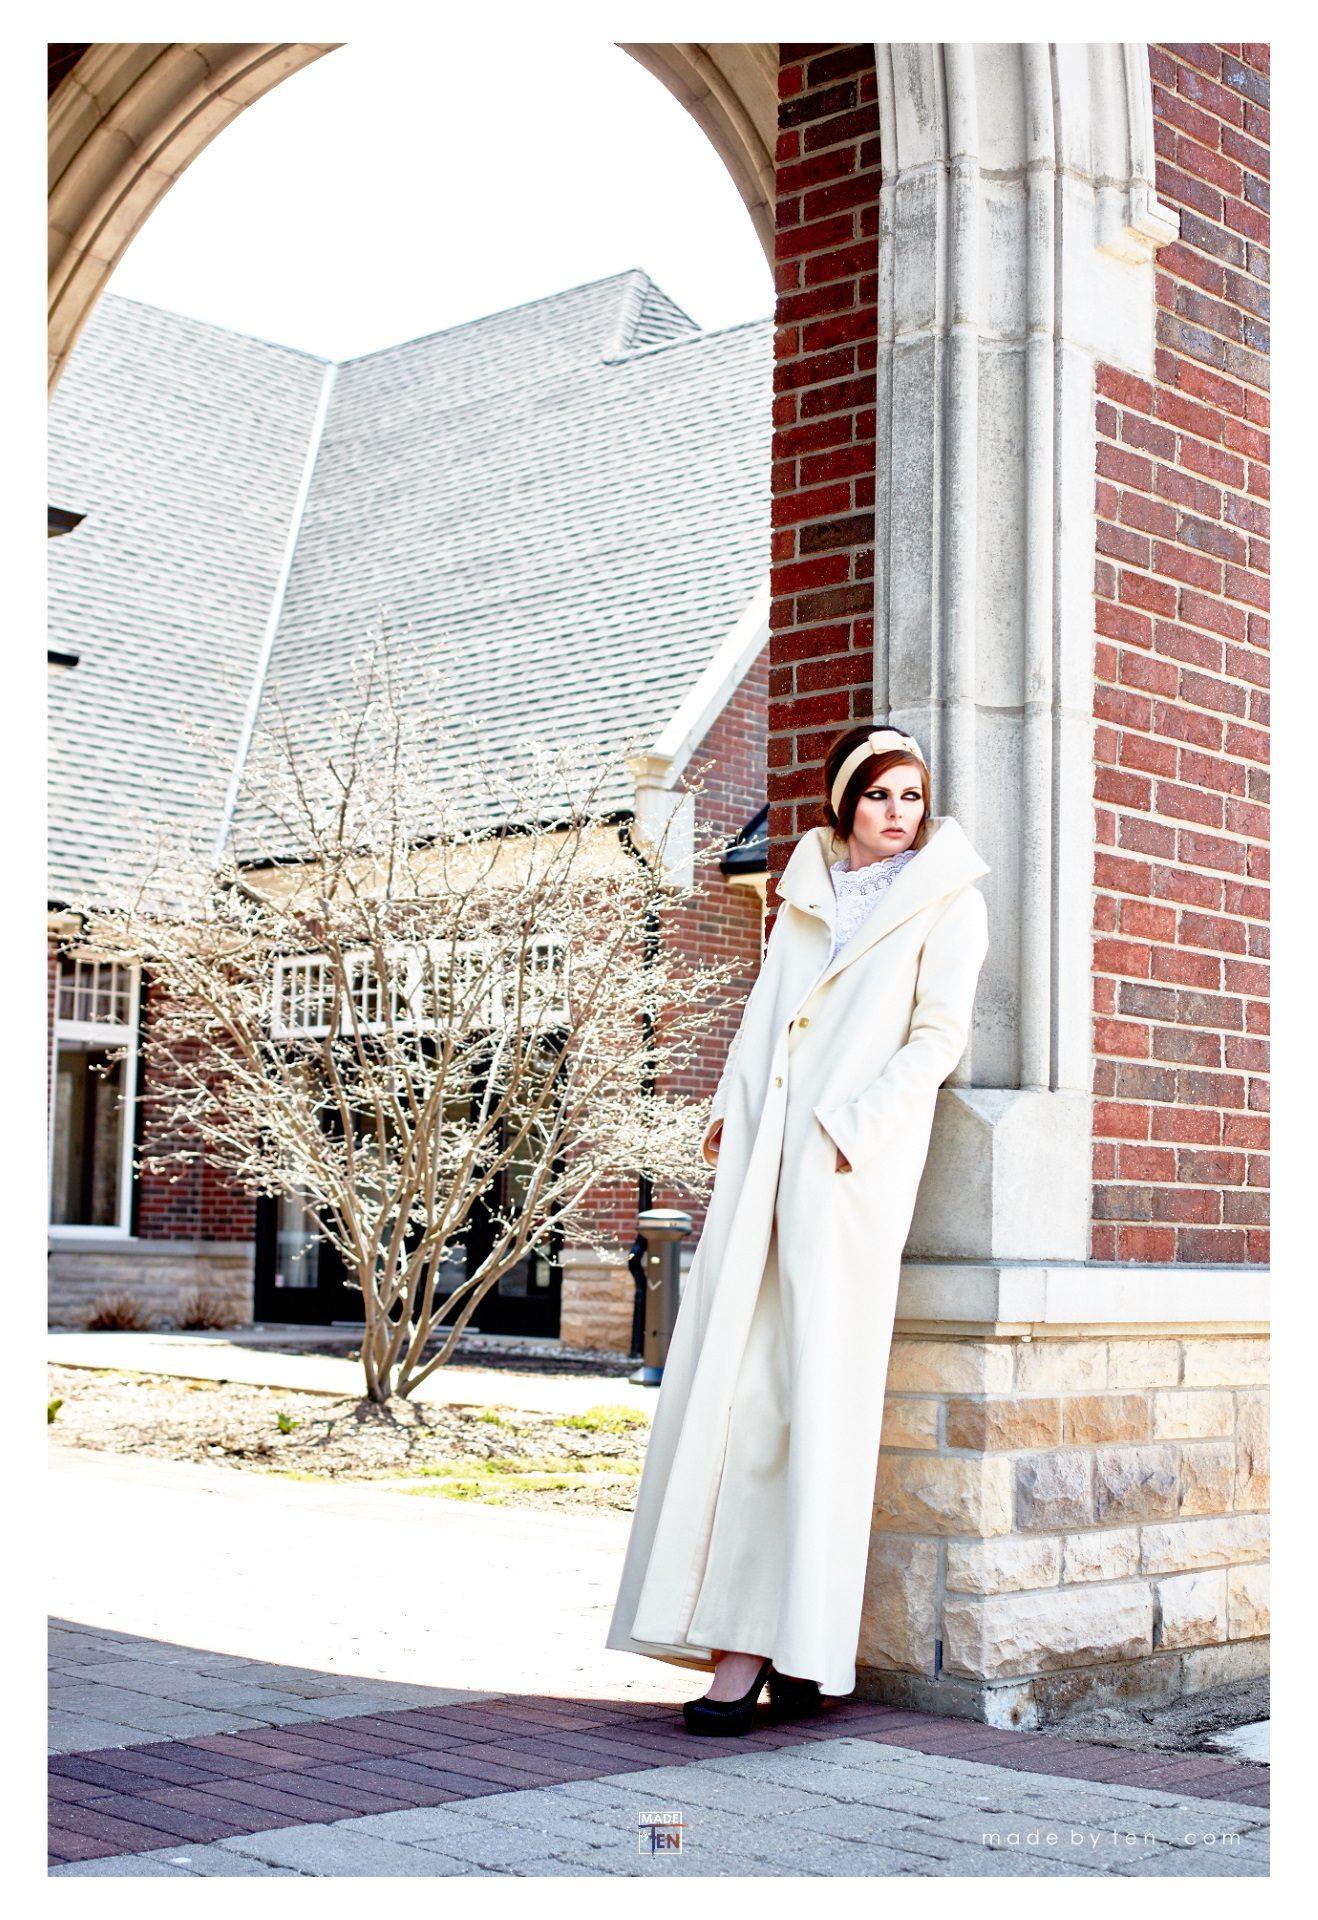 Woman Creative Jacket Building - GTA Women Fashion Photography